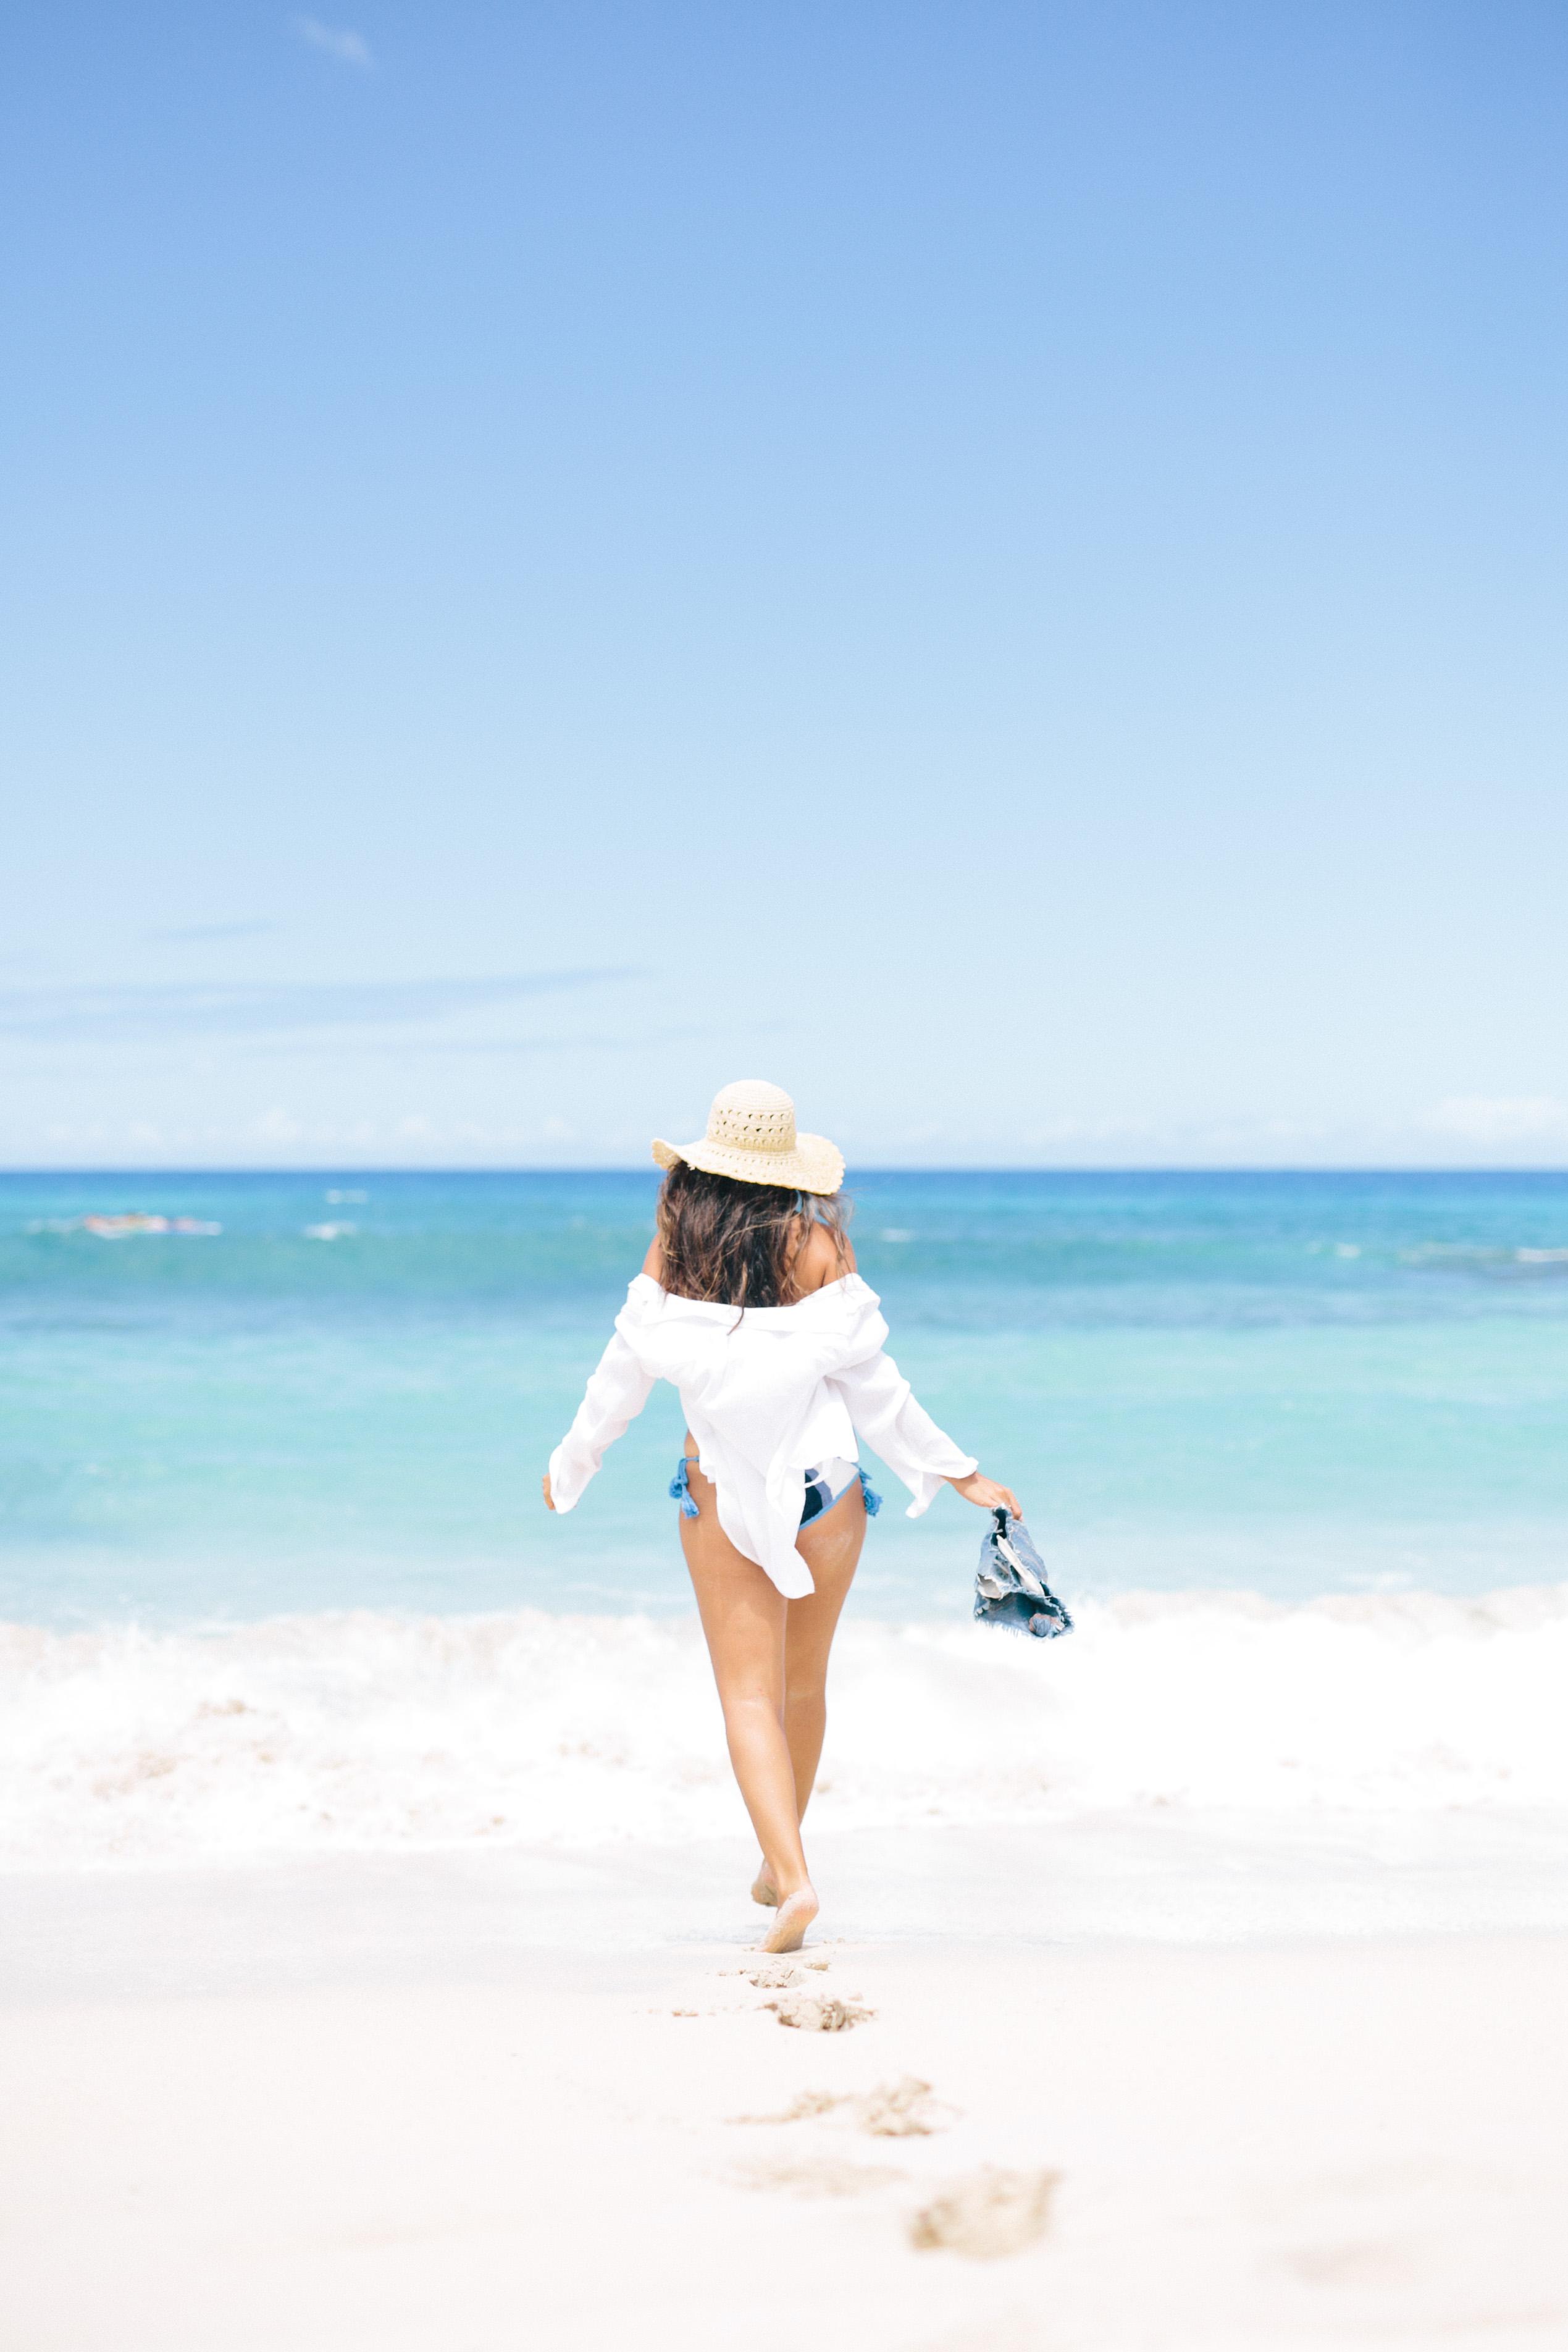 #AerieREAL Campaign | Aerie Bikini | ElanaLoo | Style Blogger | Travel Blogger | Hawaii Blogger | Tropical Vibes | Vacation Inspiration | Crochet Bikini | Crochet Swimwear | @elanaloo + elanaloo.com